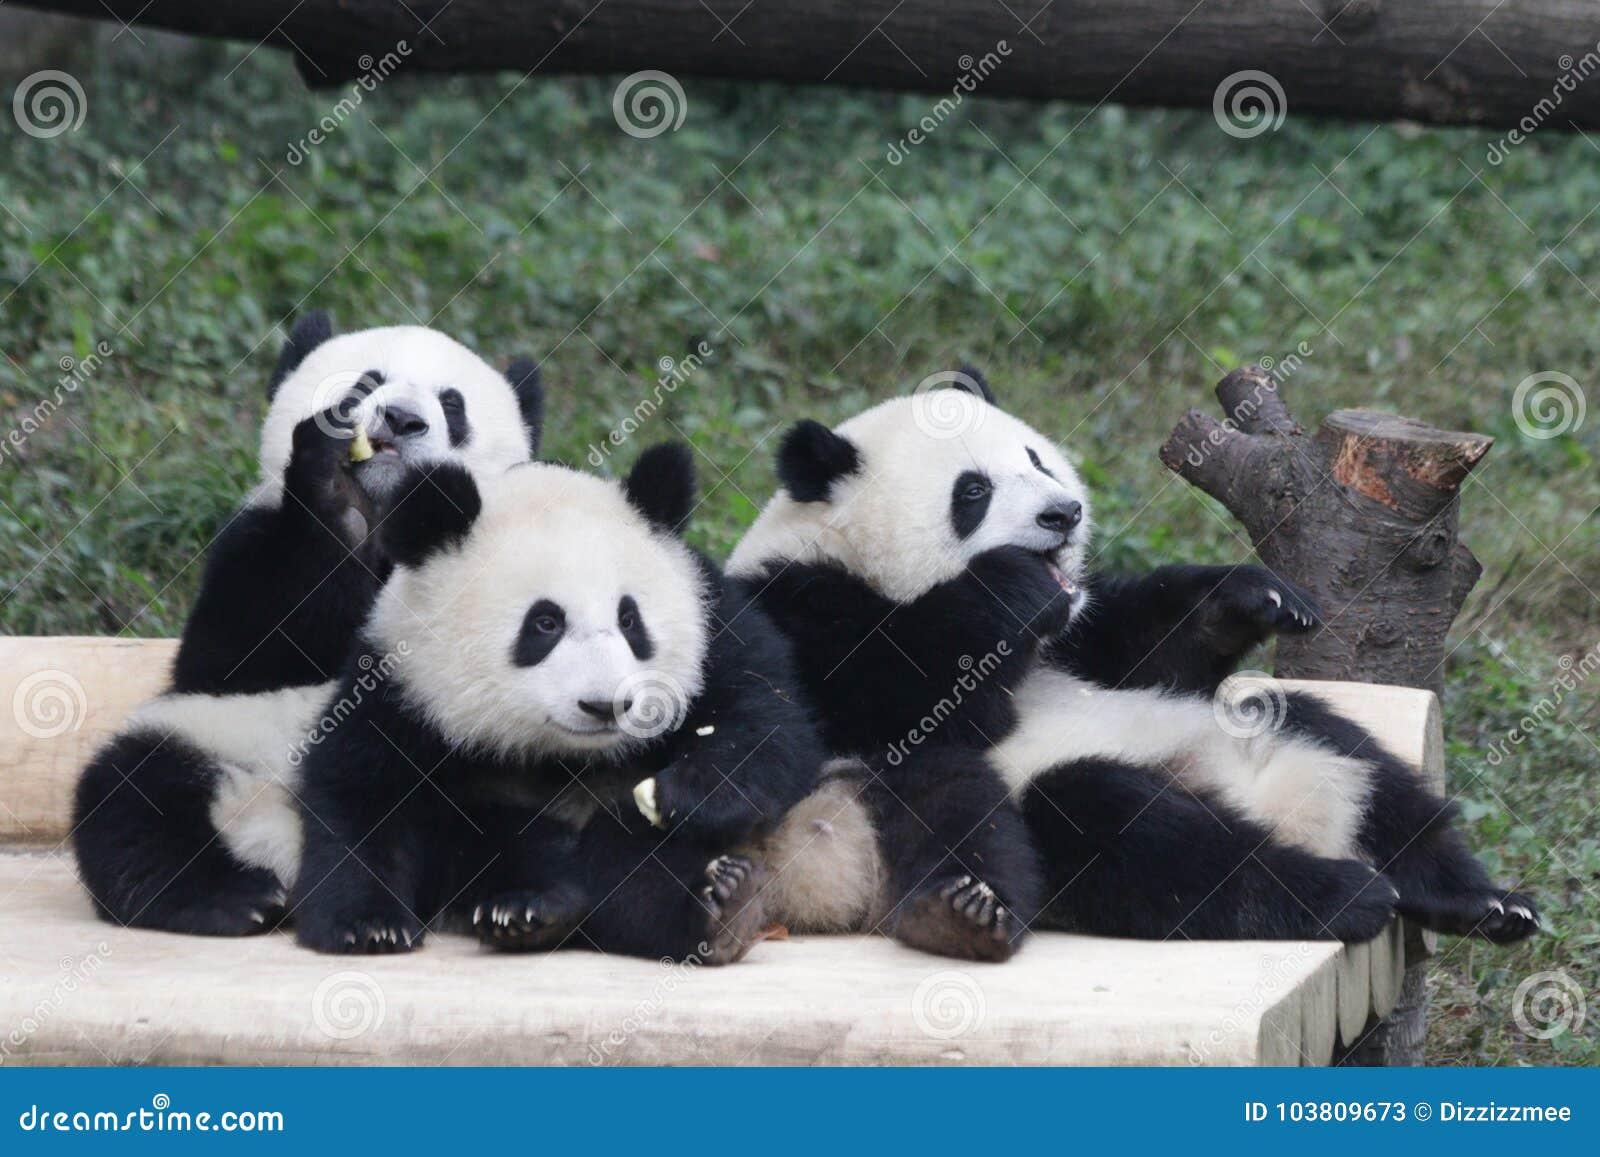 3 Panda Cubs juguetón en Chongqing, China